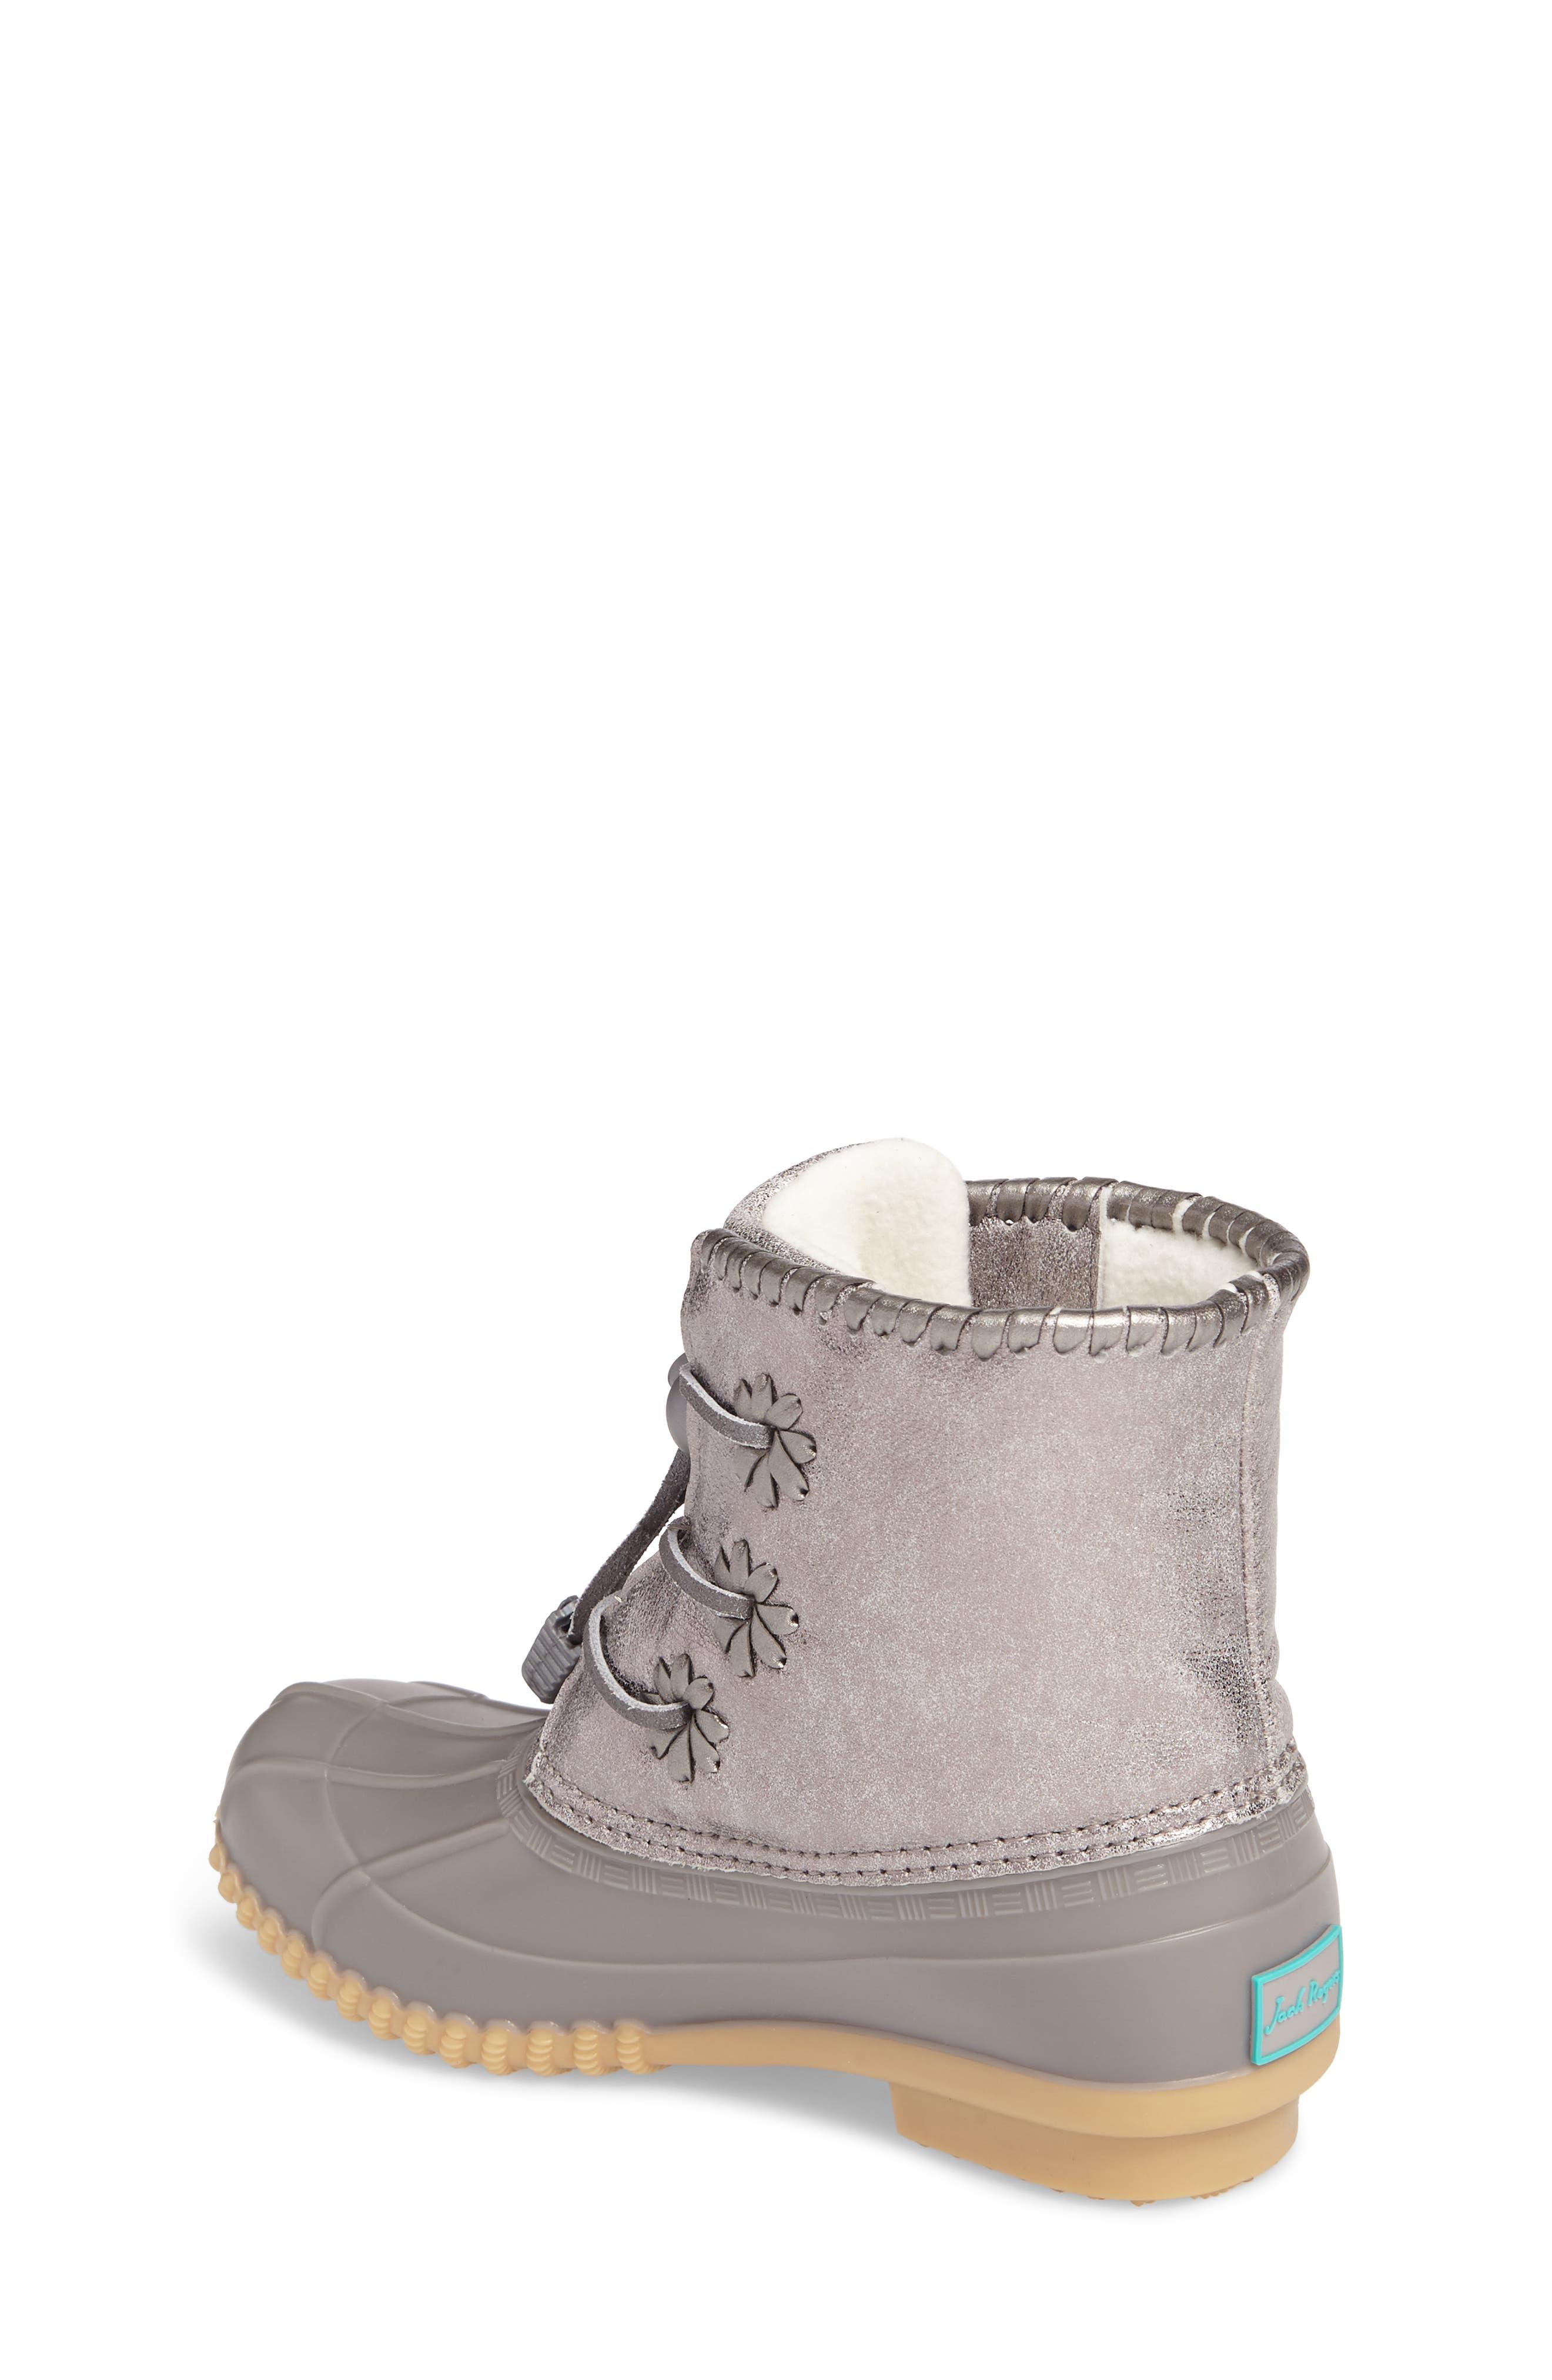 Miss Chloe Metallic Rain Boot,                             Alternate thumbnail 3, color,